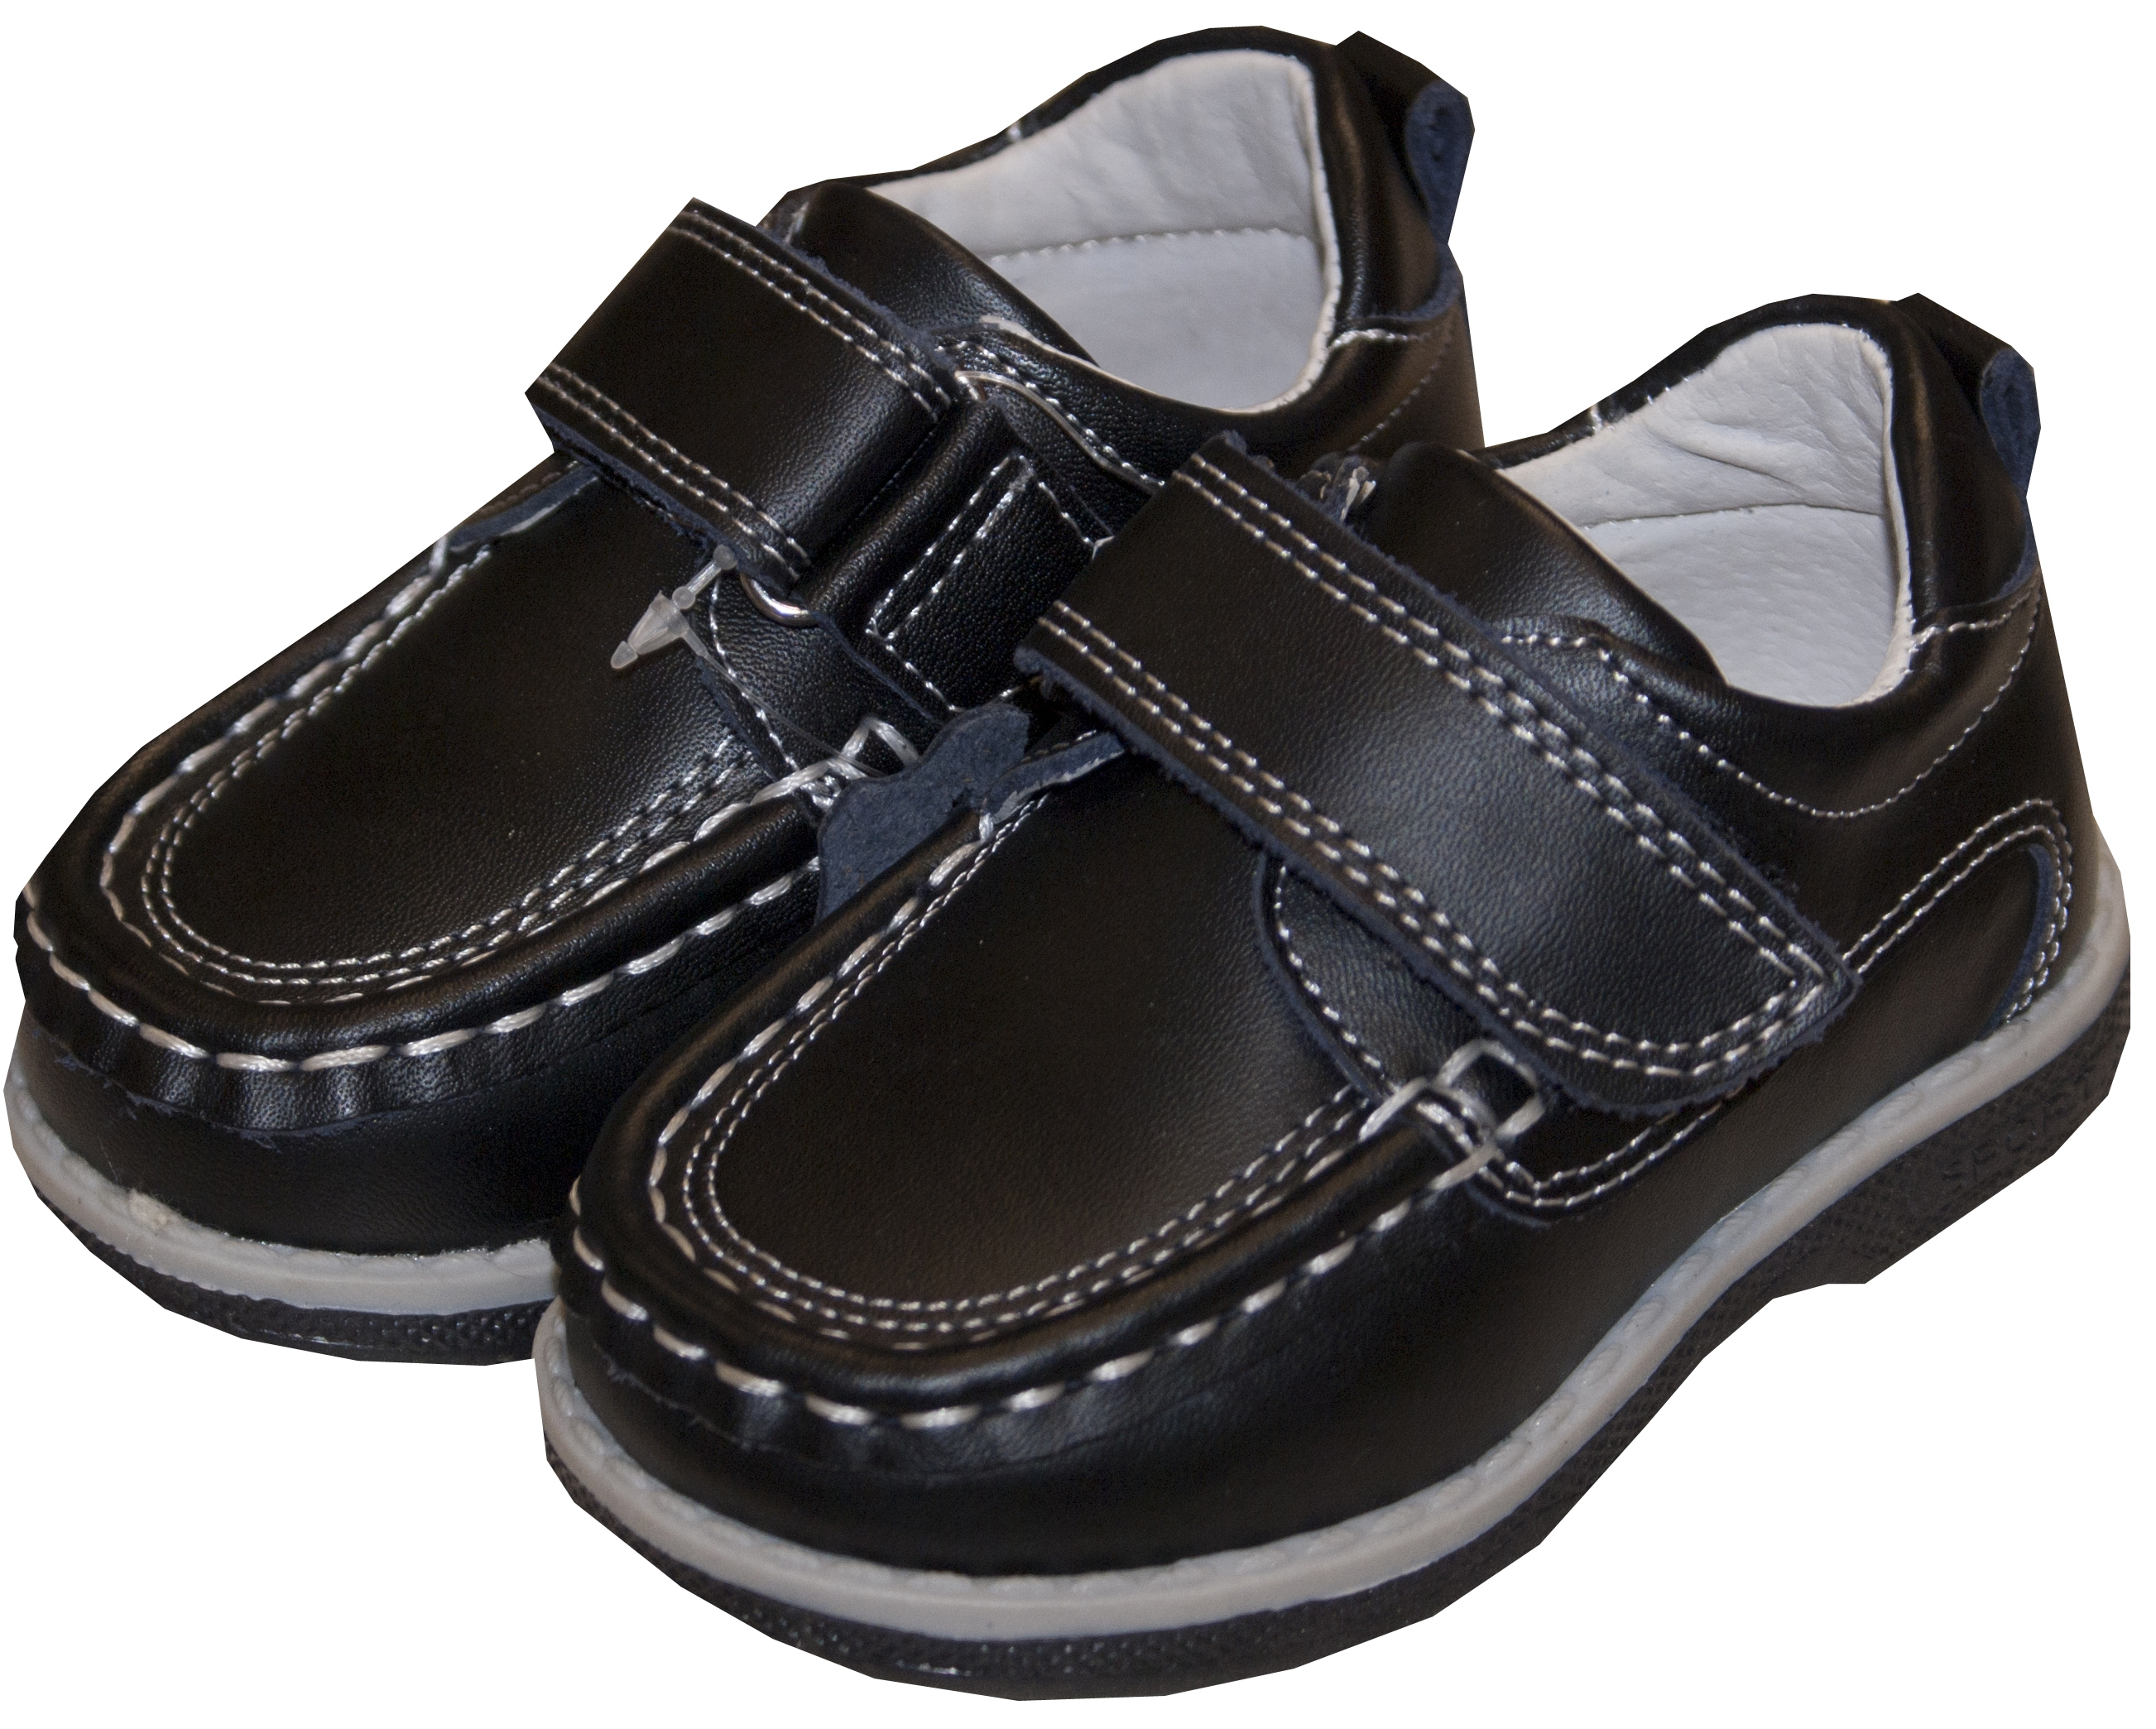 Ботинки и полуботинки Barkito Полуботинки для мальчика Barkito черный полуботинки coccodrillo полуботинки